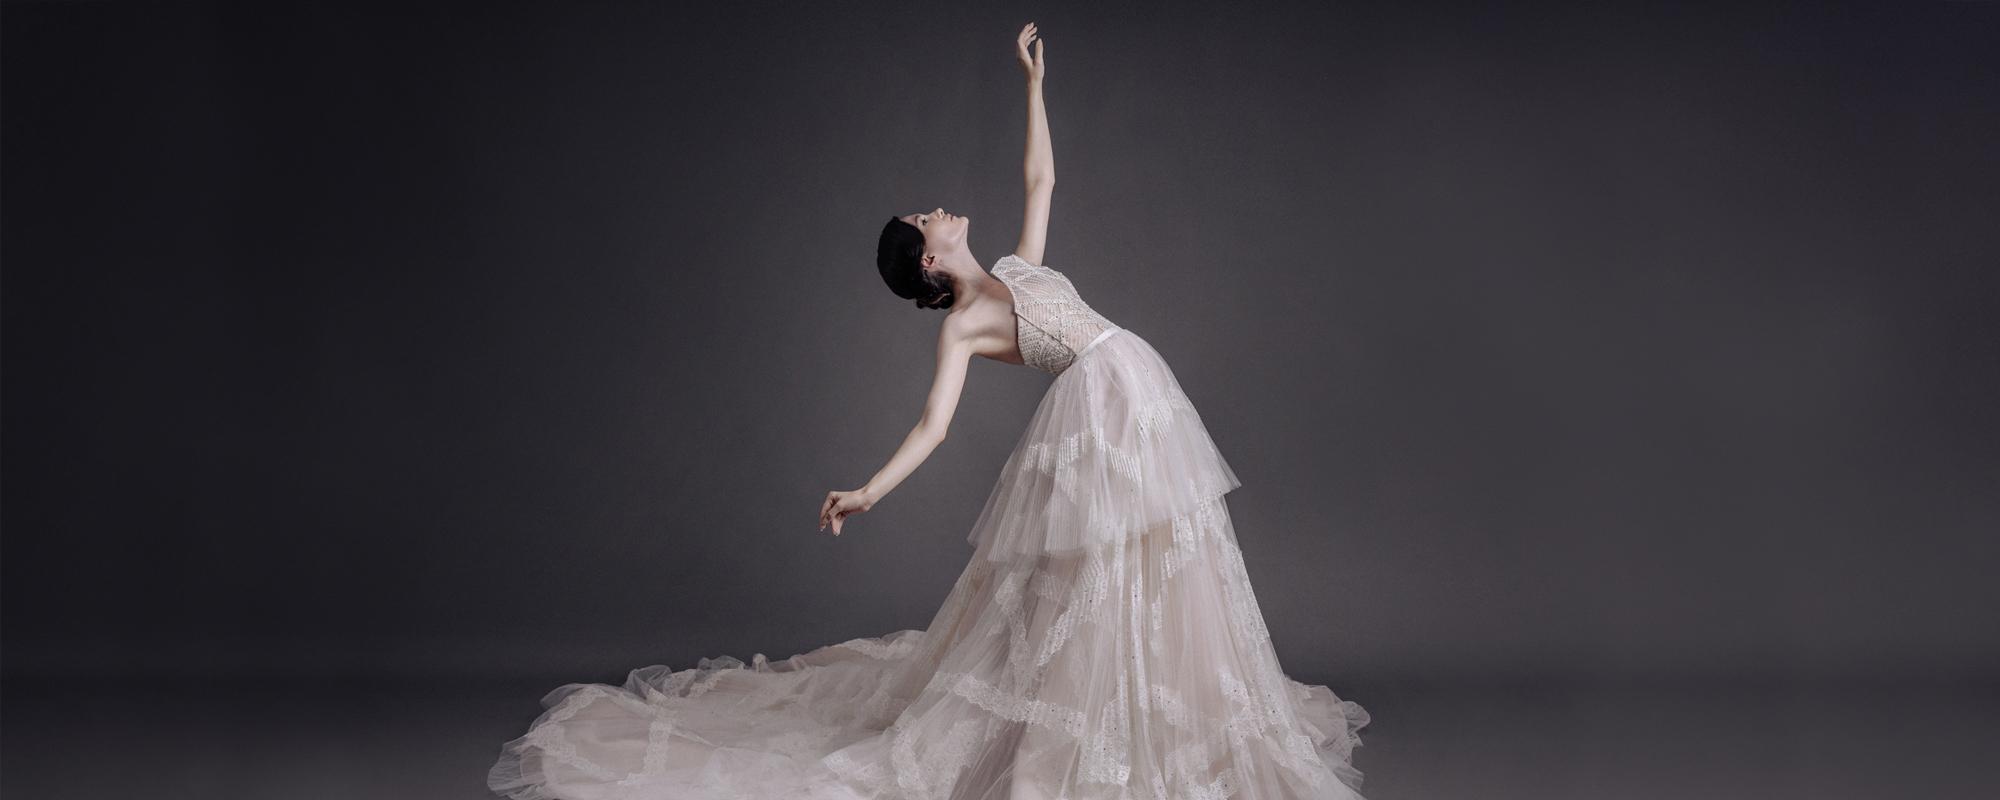 Fashion Focus David Tutera Atelier For Virginia Bride Magazine David Tutera,Budget Wedding Dresses Brisbane